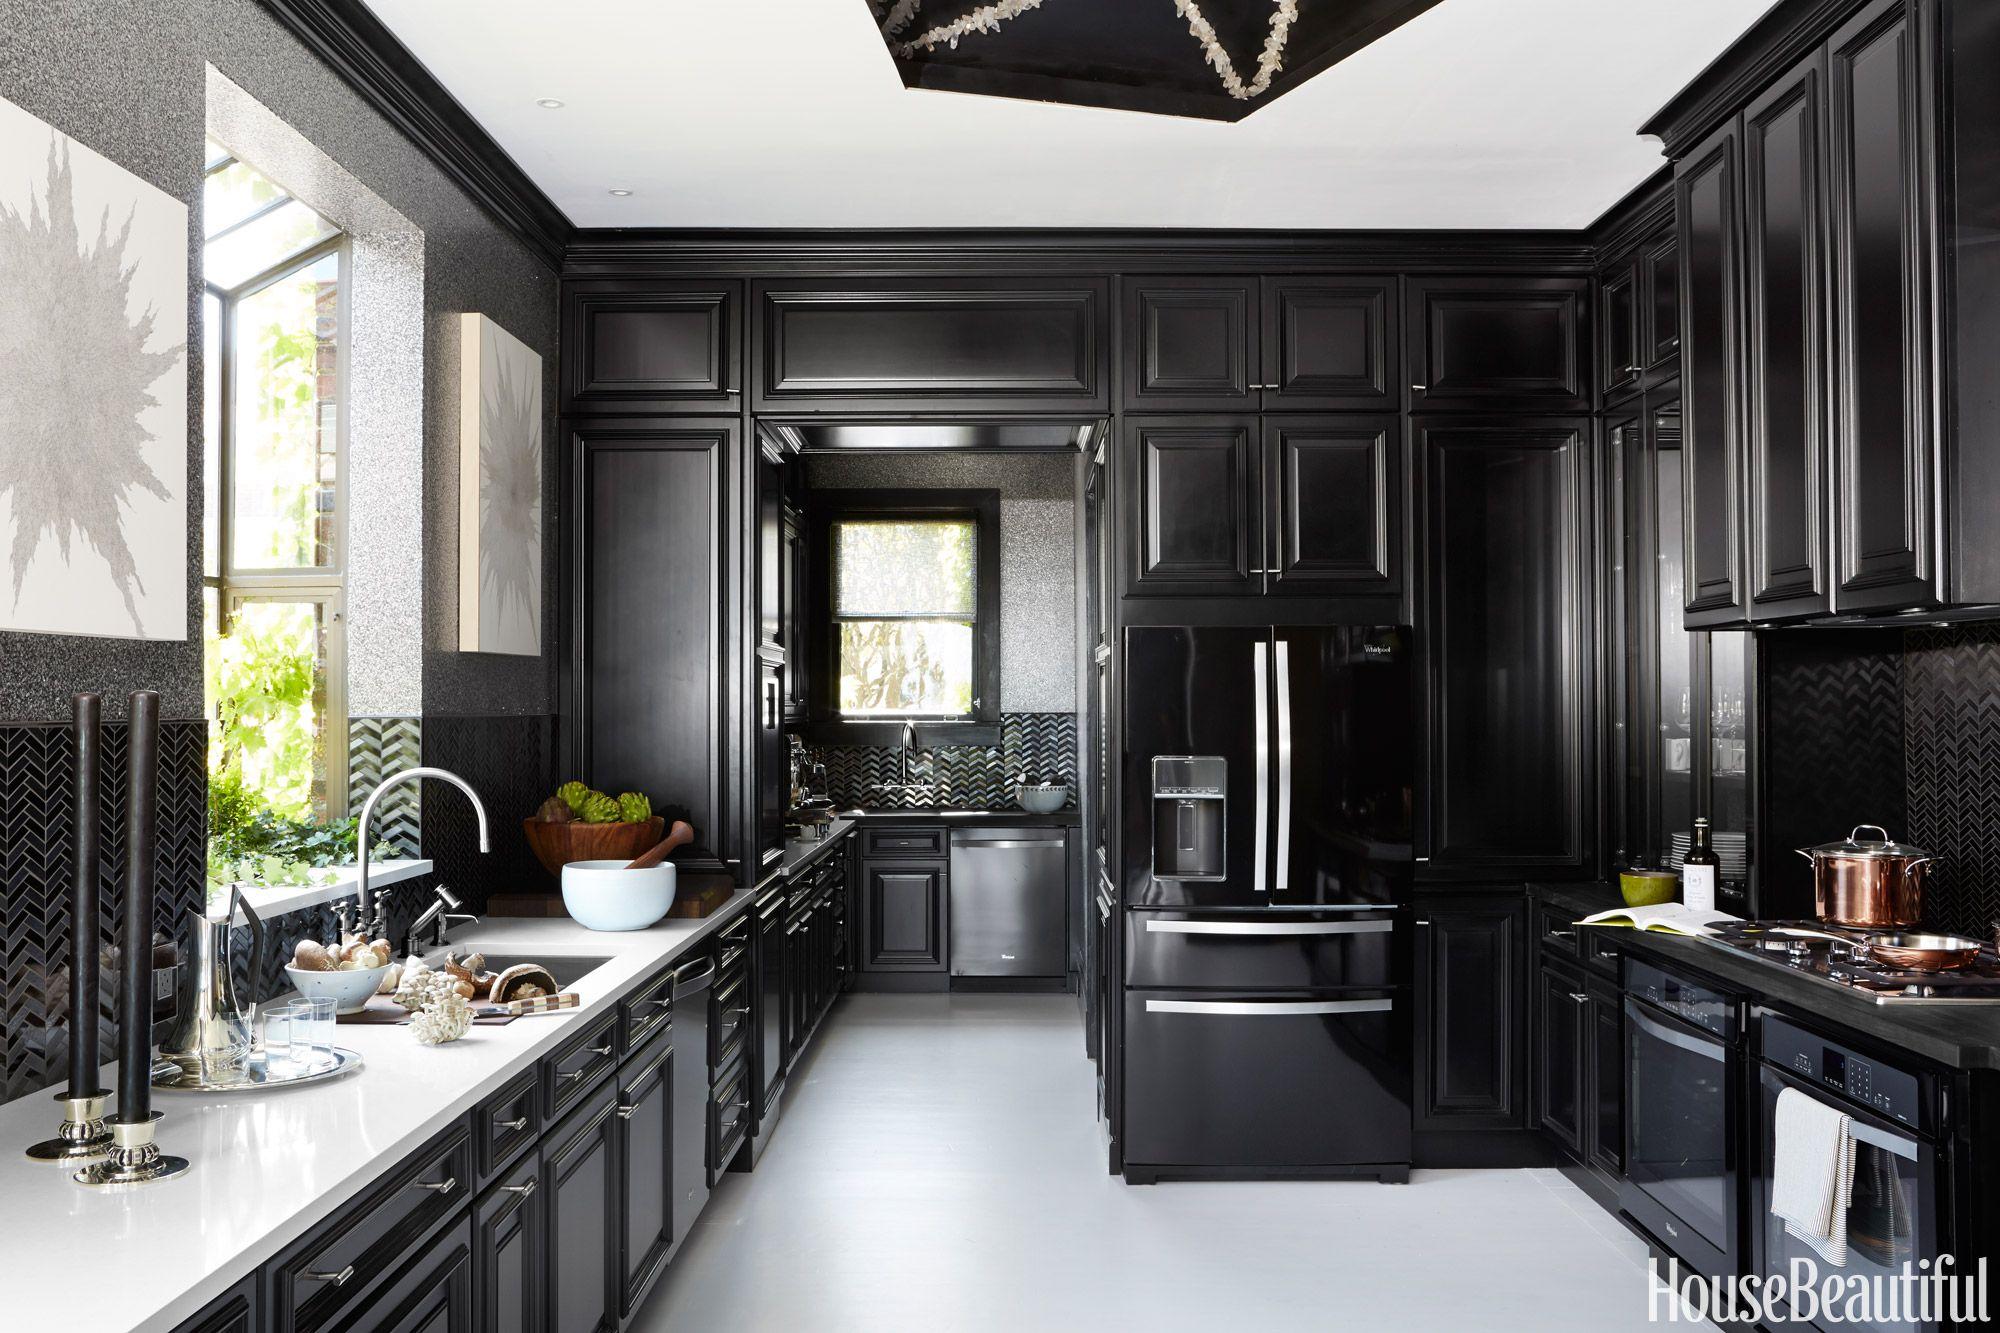 95 Designer Kitchens That Ll Inspire You To Renovate Yours Popular Kitchen Designs Black Kitchens Kitchen Interior